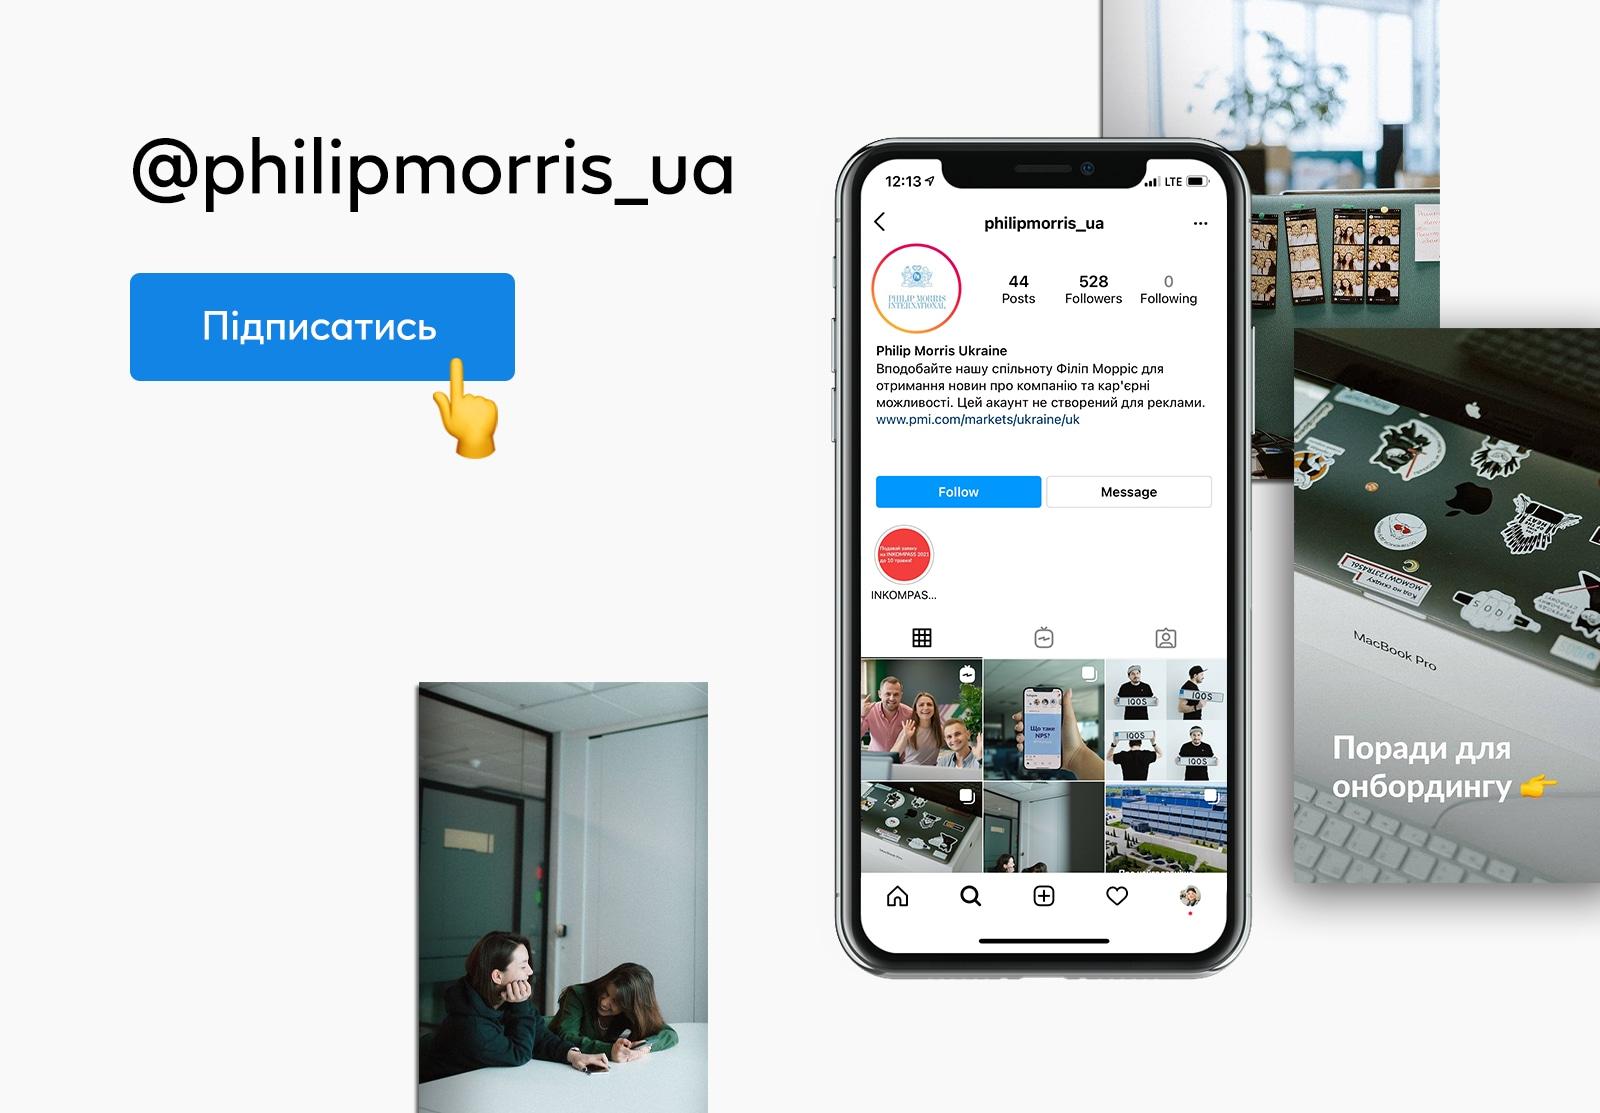 Філіп Морріс Україна Instagram